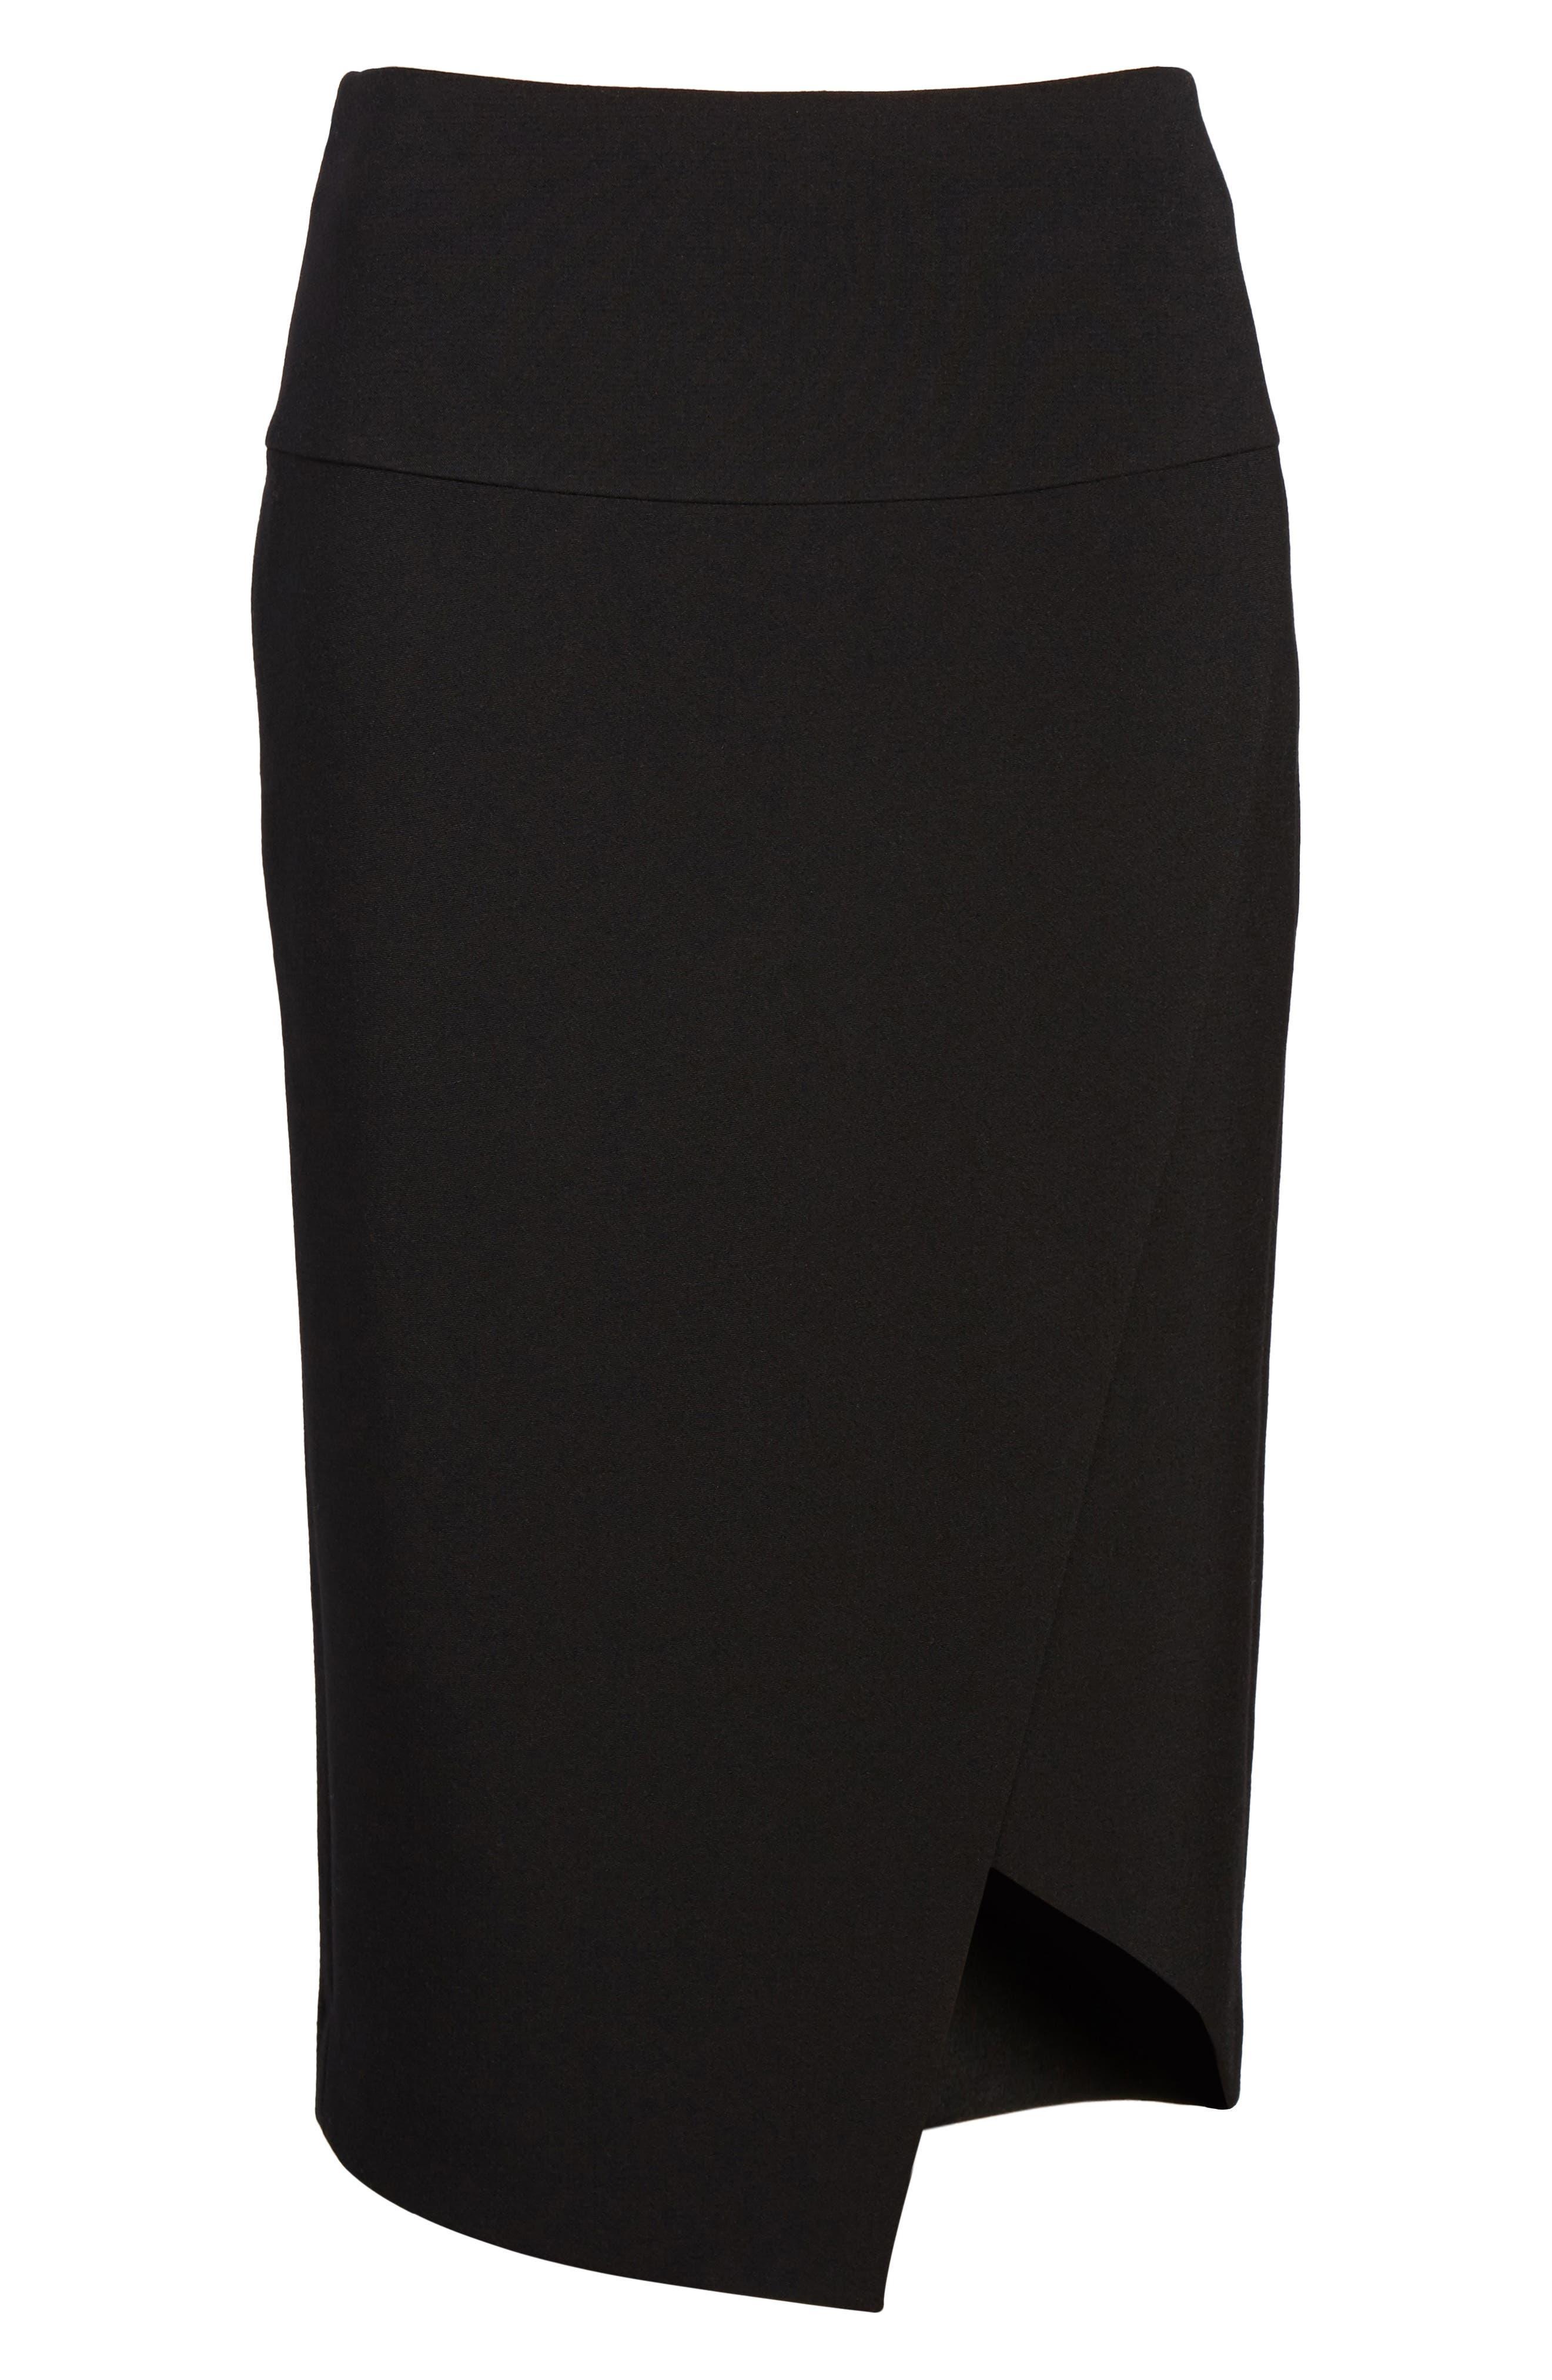 Asymmetrical Pencil Skirt,                             Alternate thumbnail 6, color,                             Black